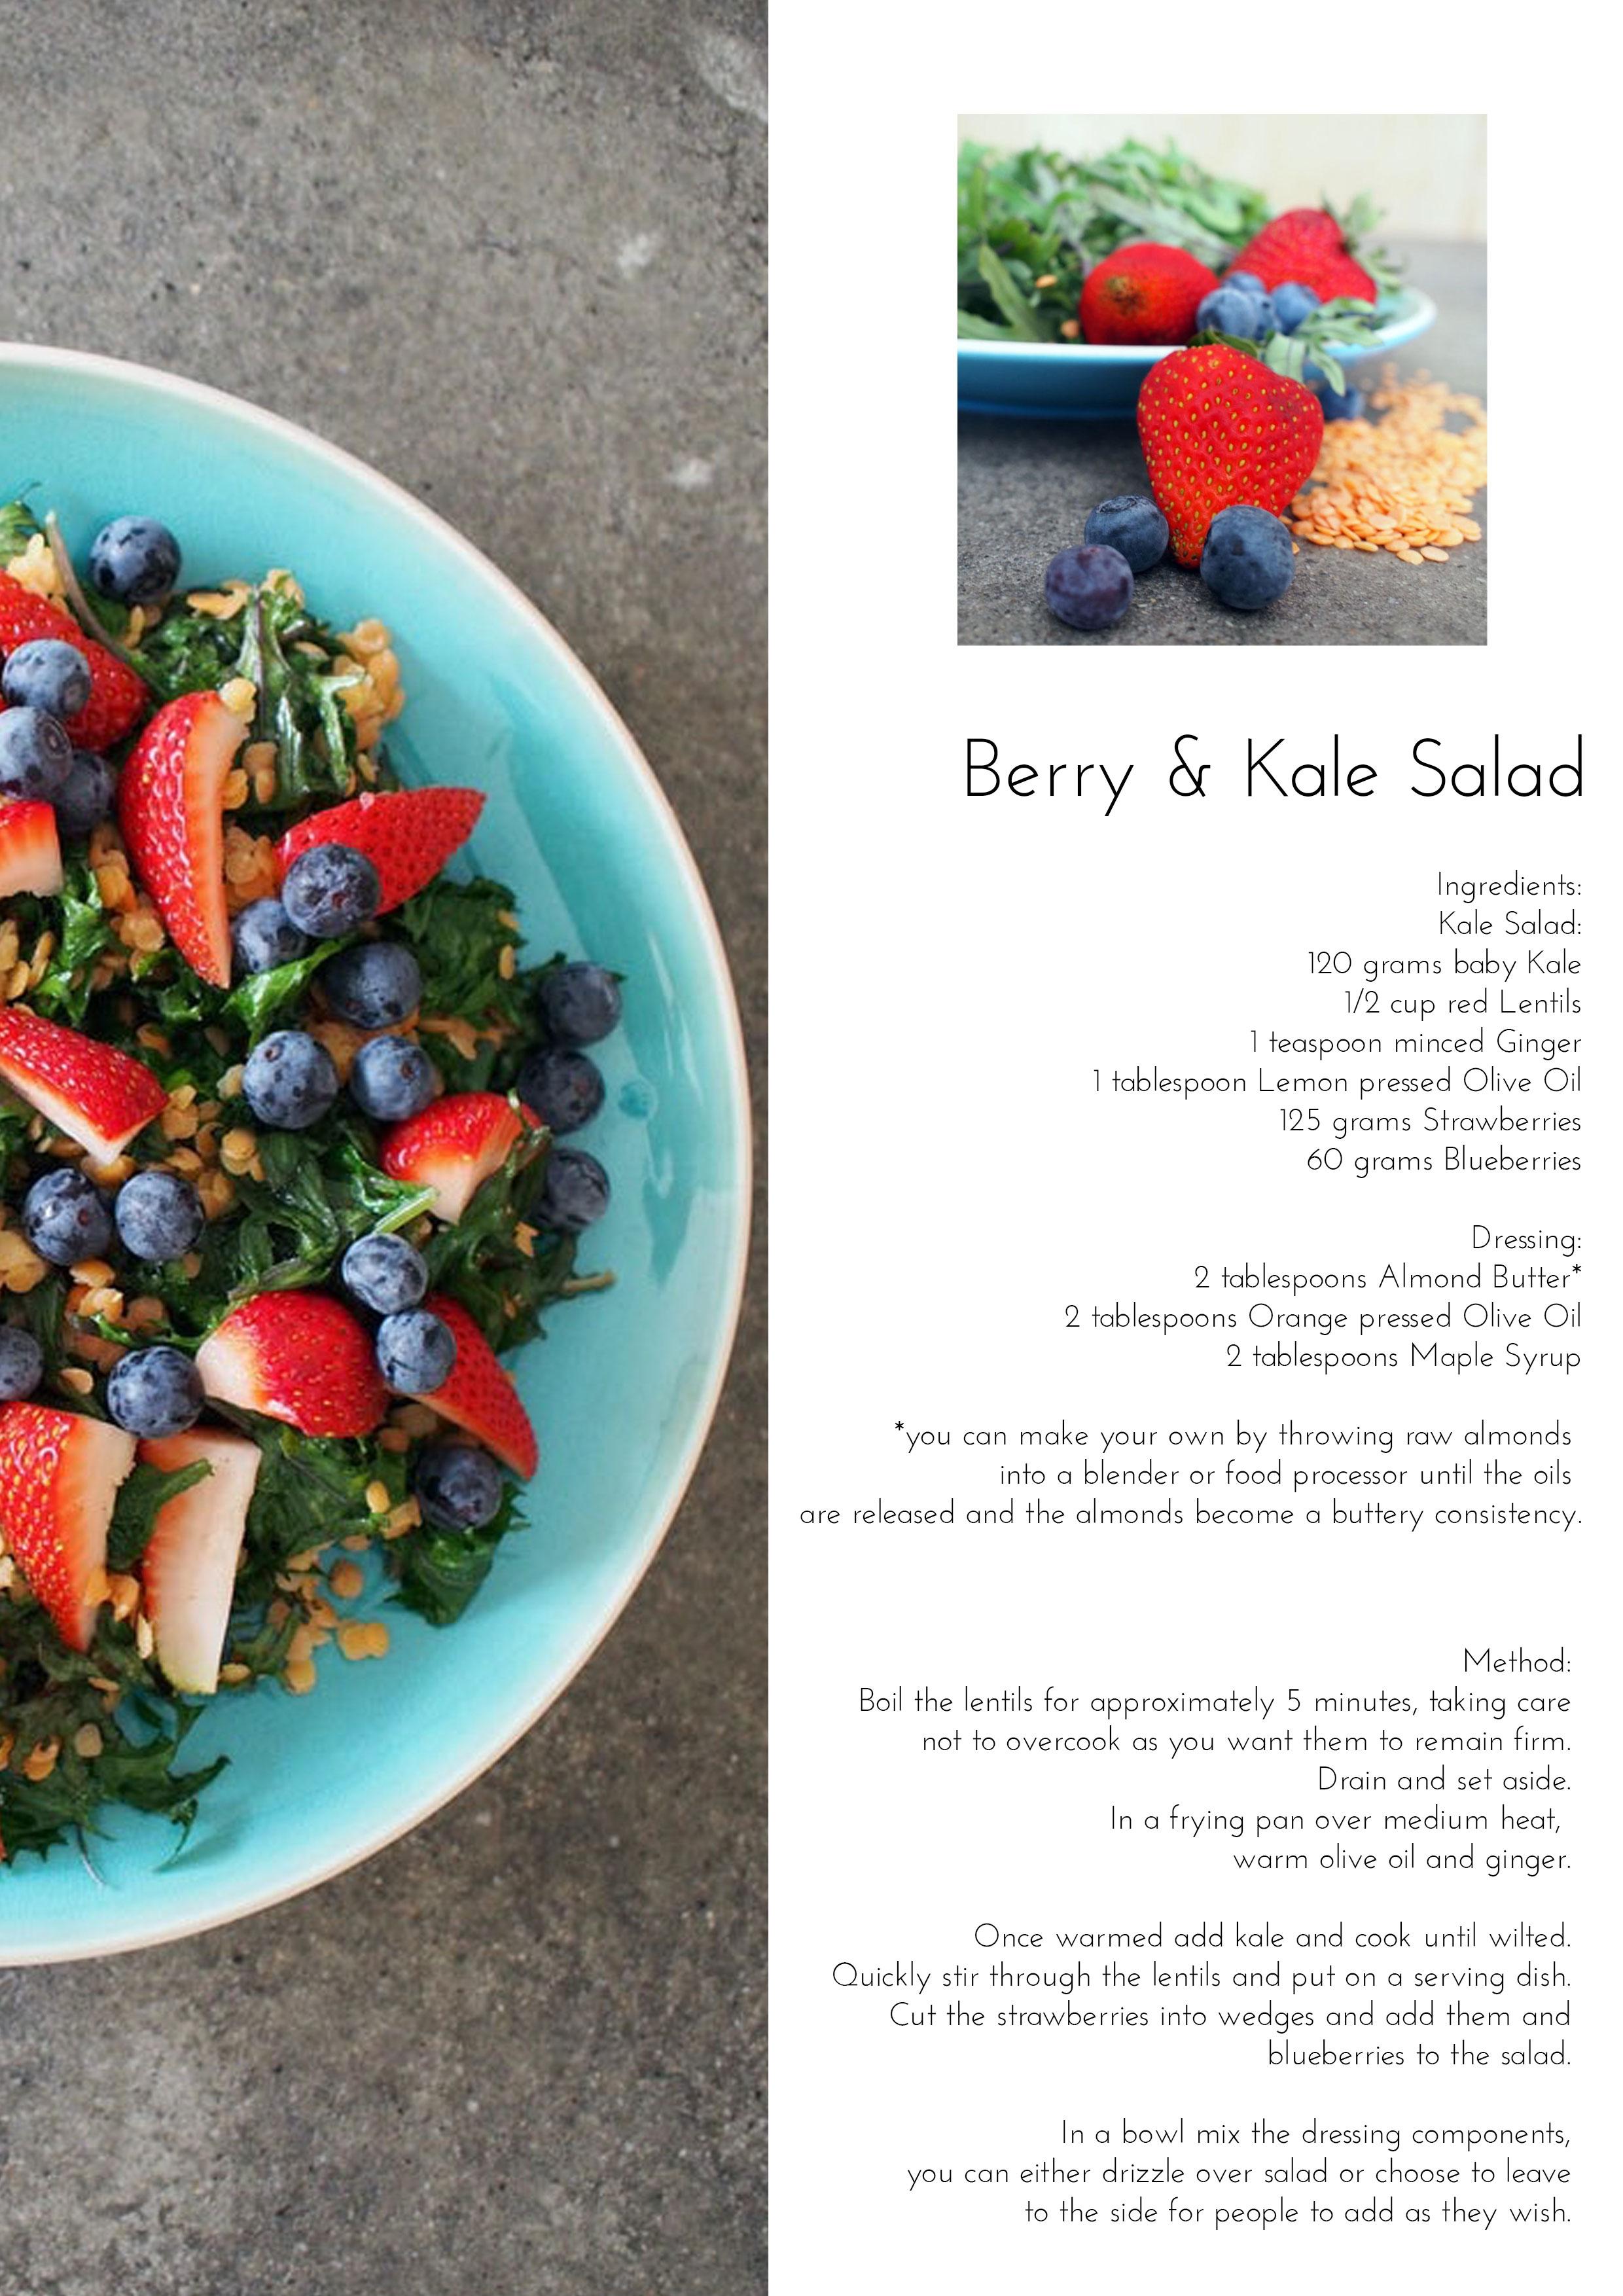 Berry-&-Kale-Salad.jpg